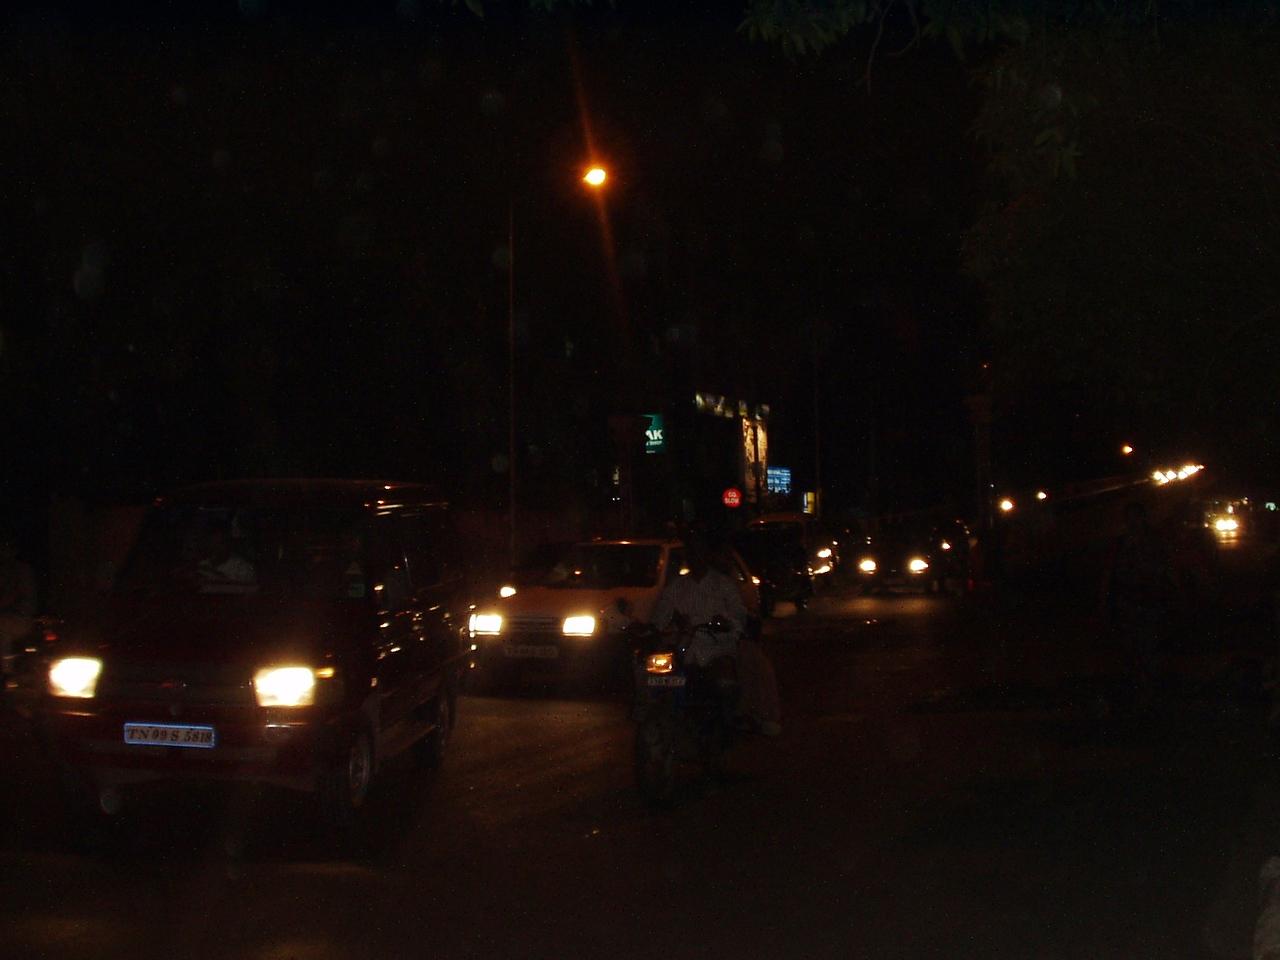 20 November: Traffic